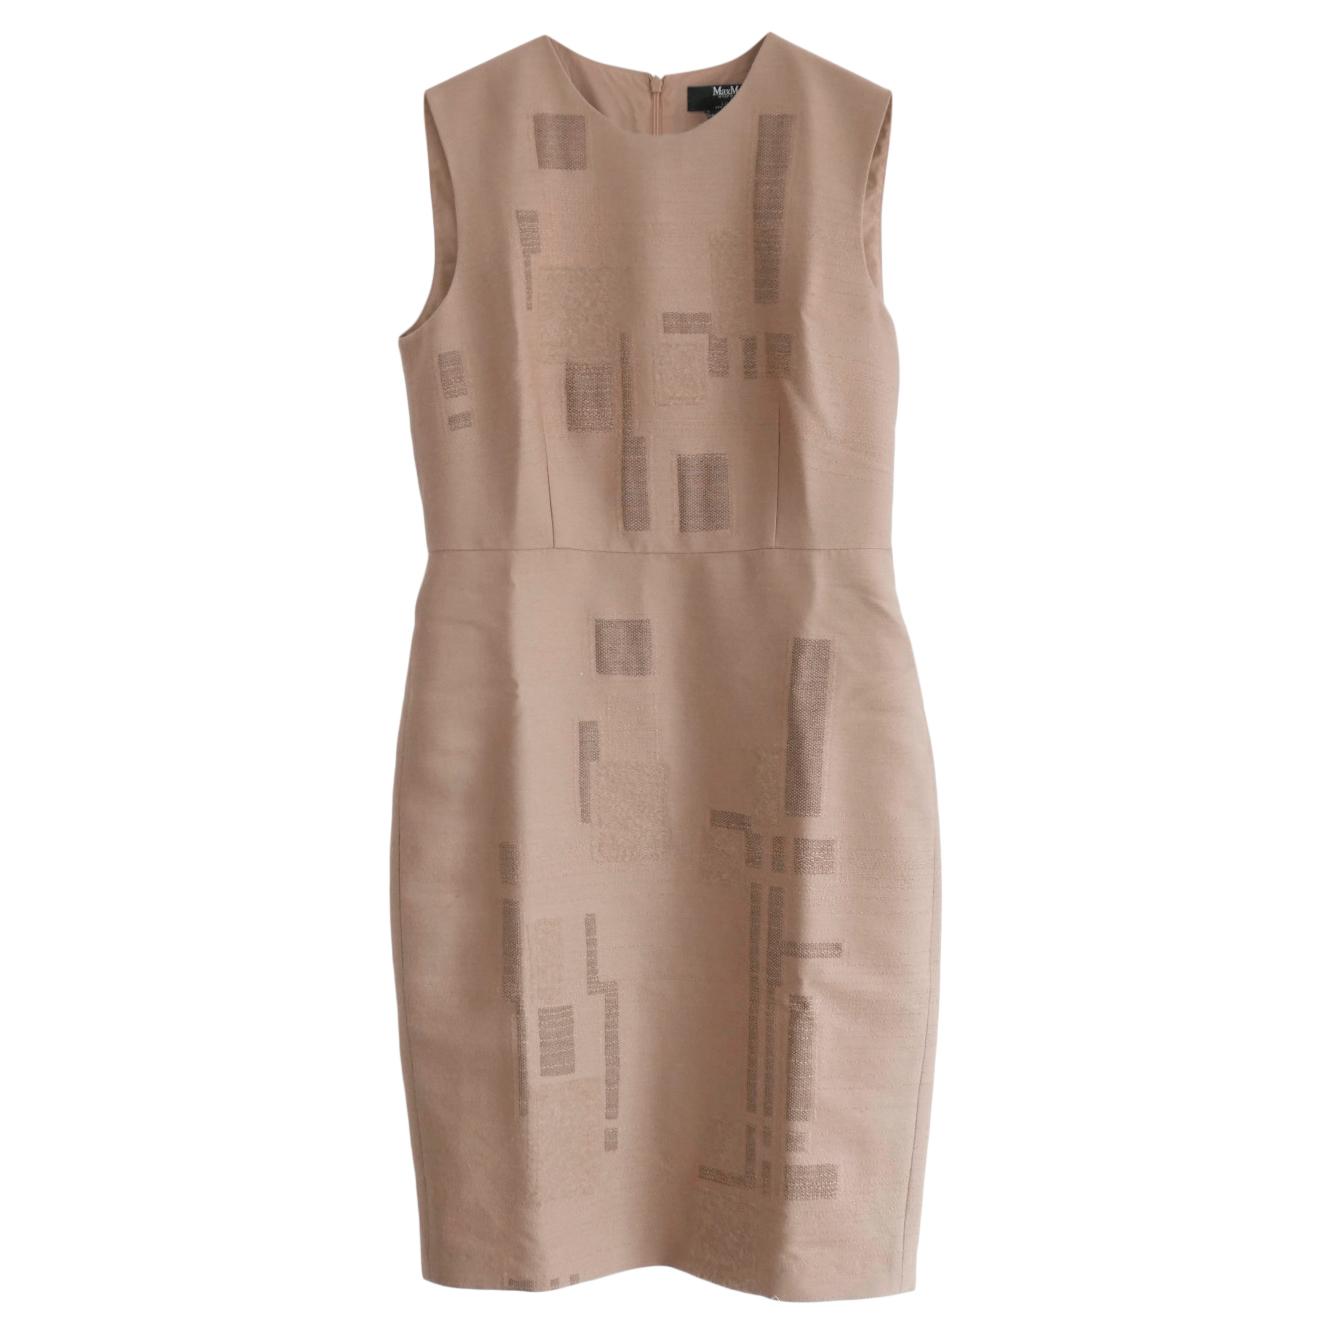 Max Mara x Liu Wei Nude Embroidered Wool Blend Dress